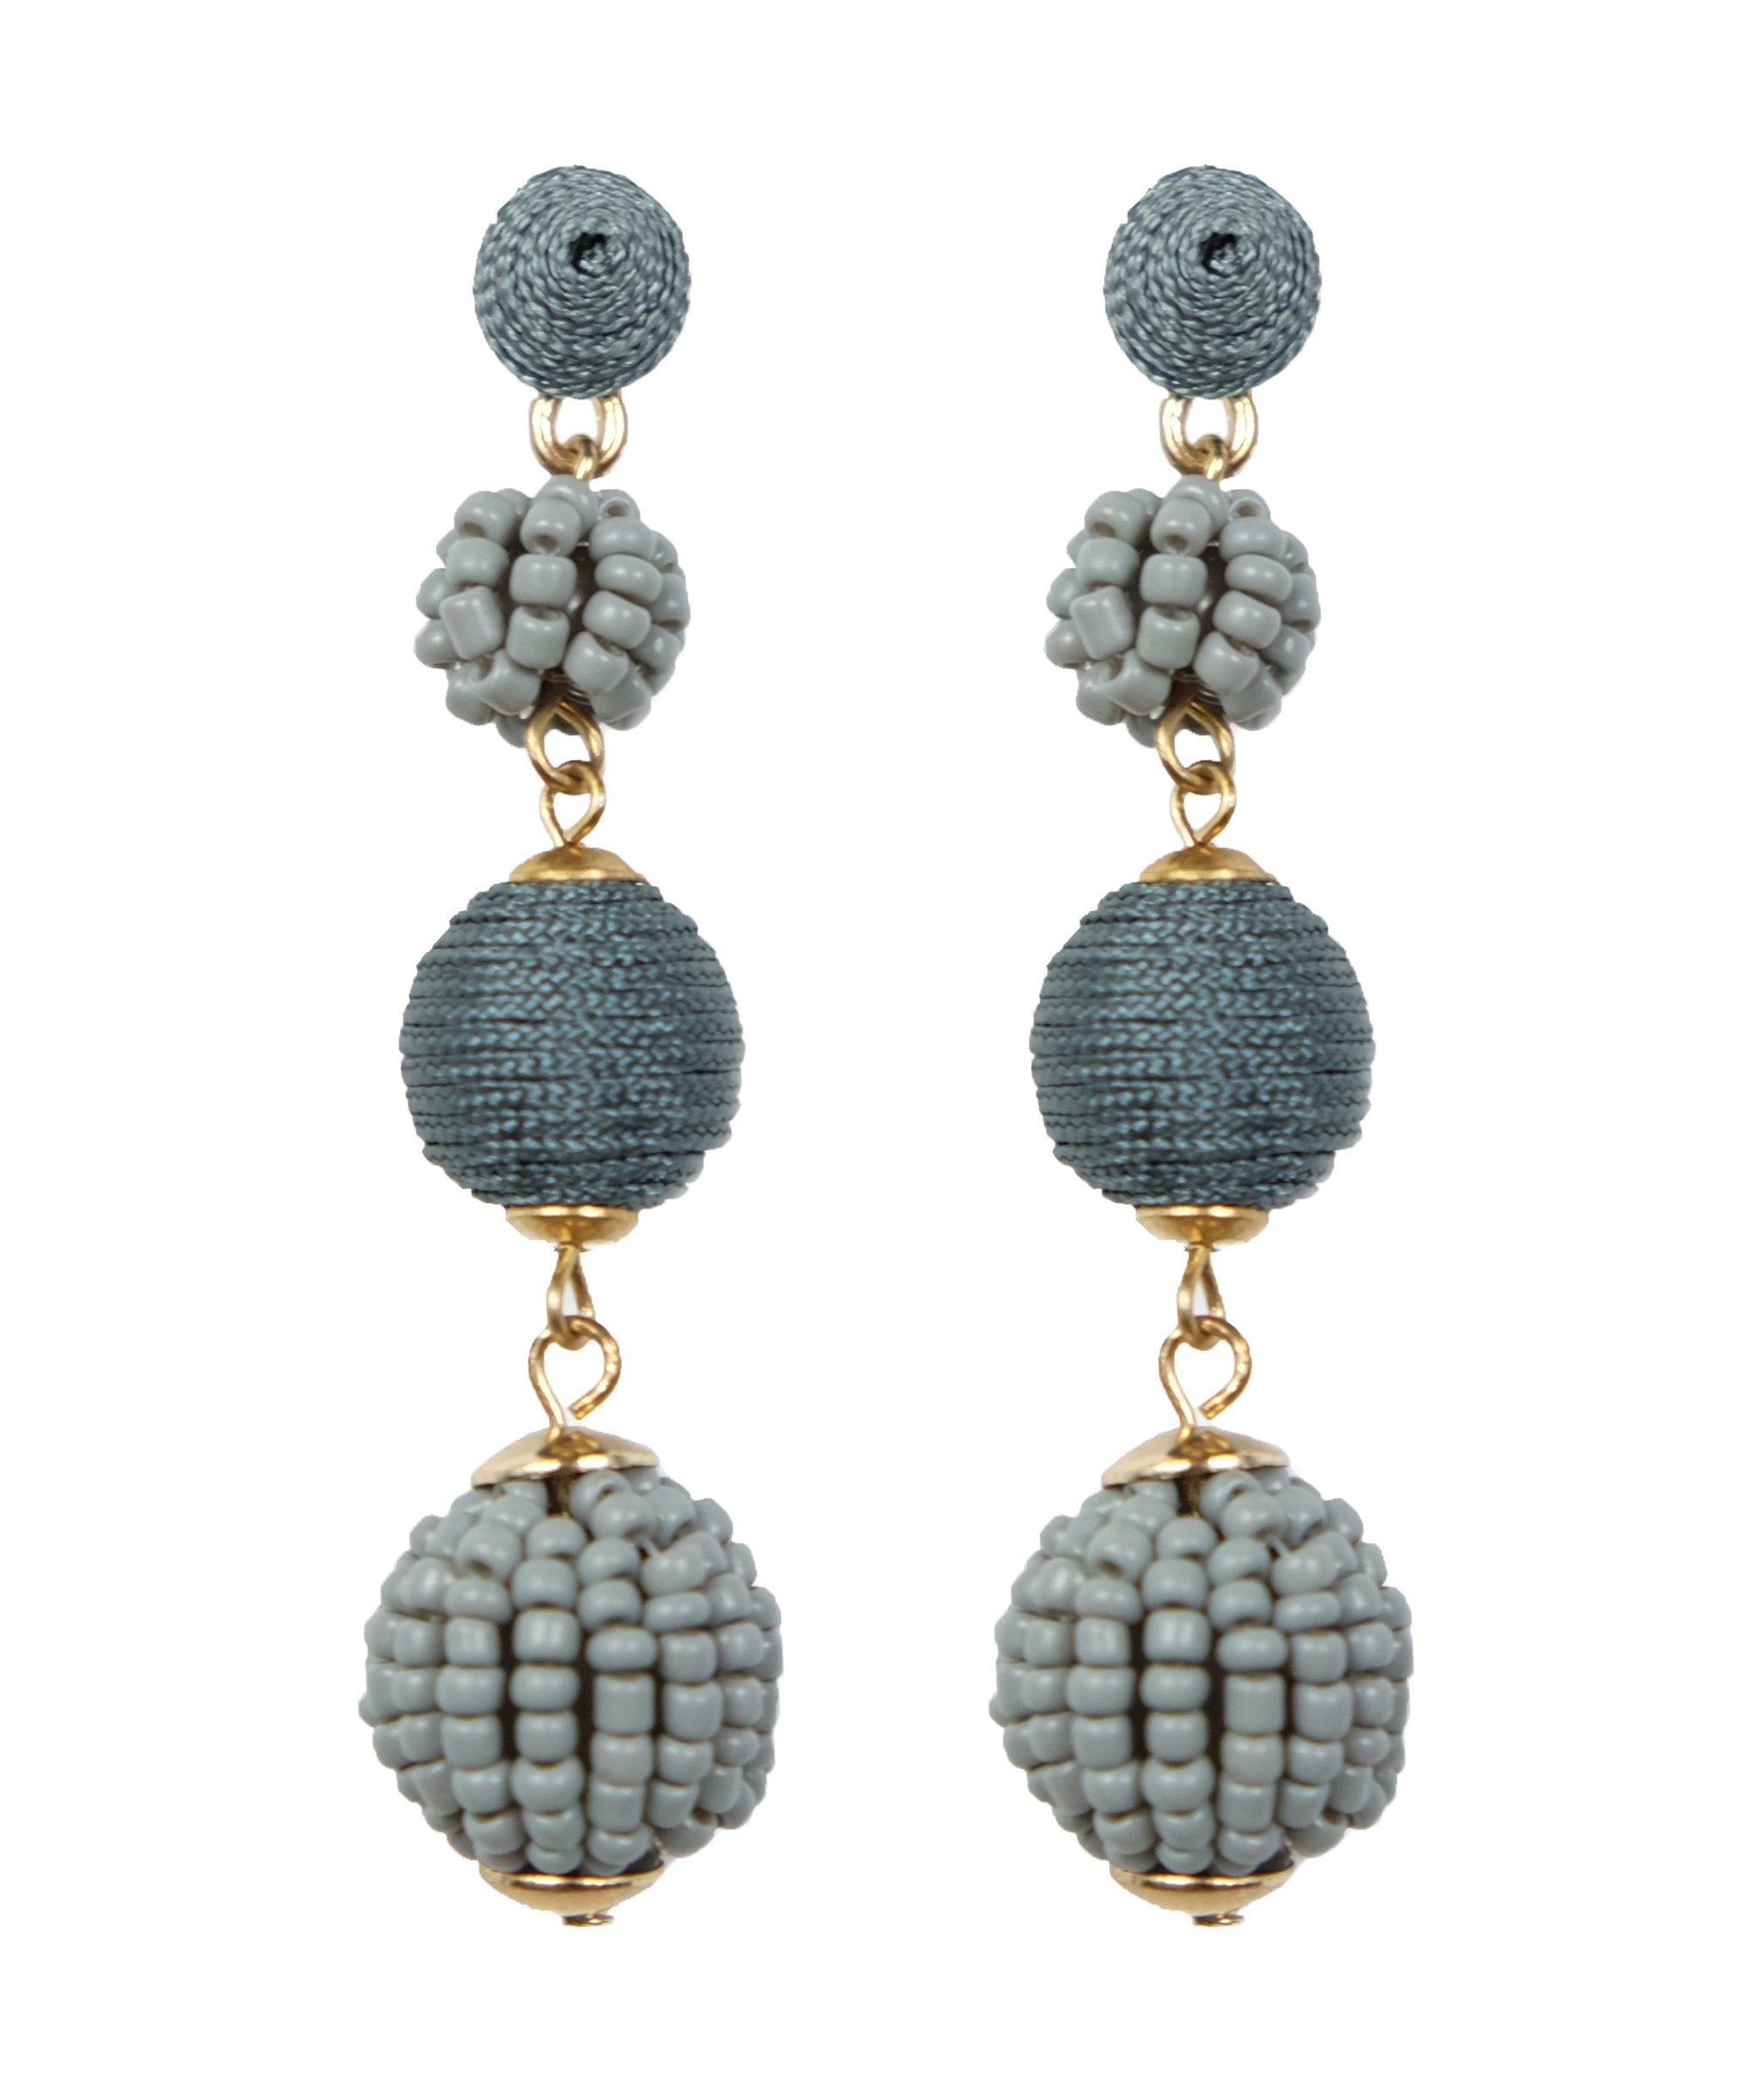 Bee Wee Jewelry Sydney Bead and Thread Ball Drop Earrings - Bon Bon Beaded Woven Silky Triple Thread Ball Seed Bead Dangle Bubble Boho Bohemian Ear Drop Soriee Statement Dangles (Gray)